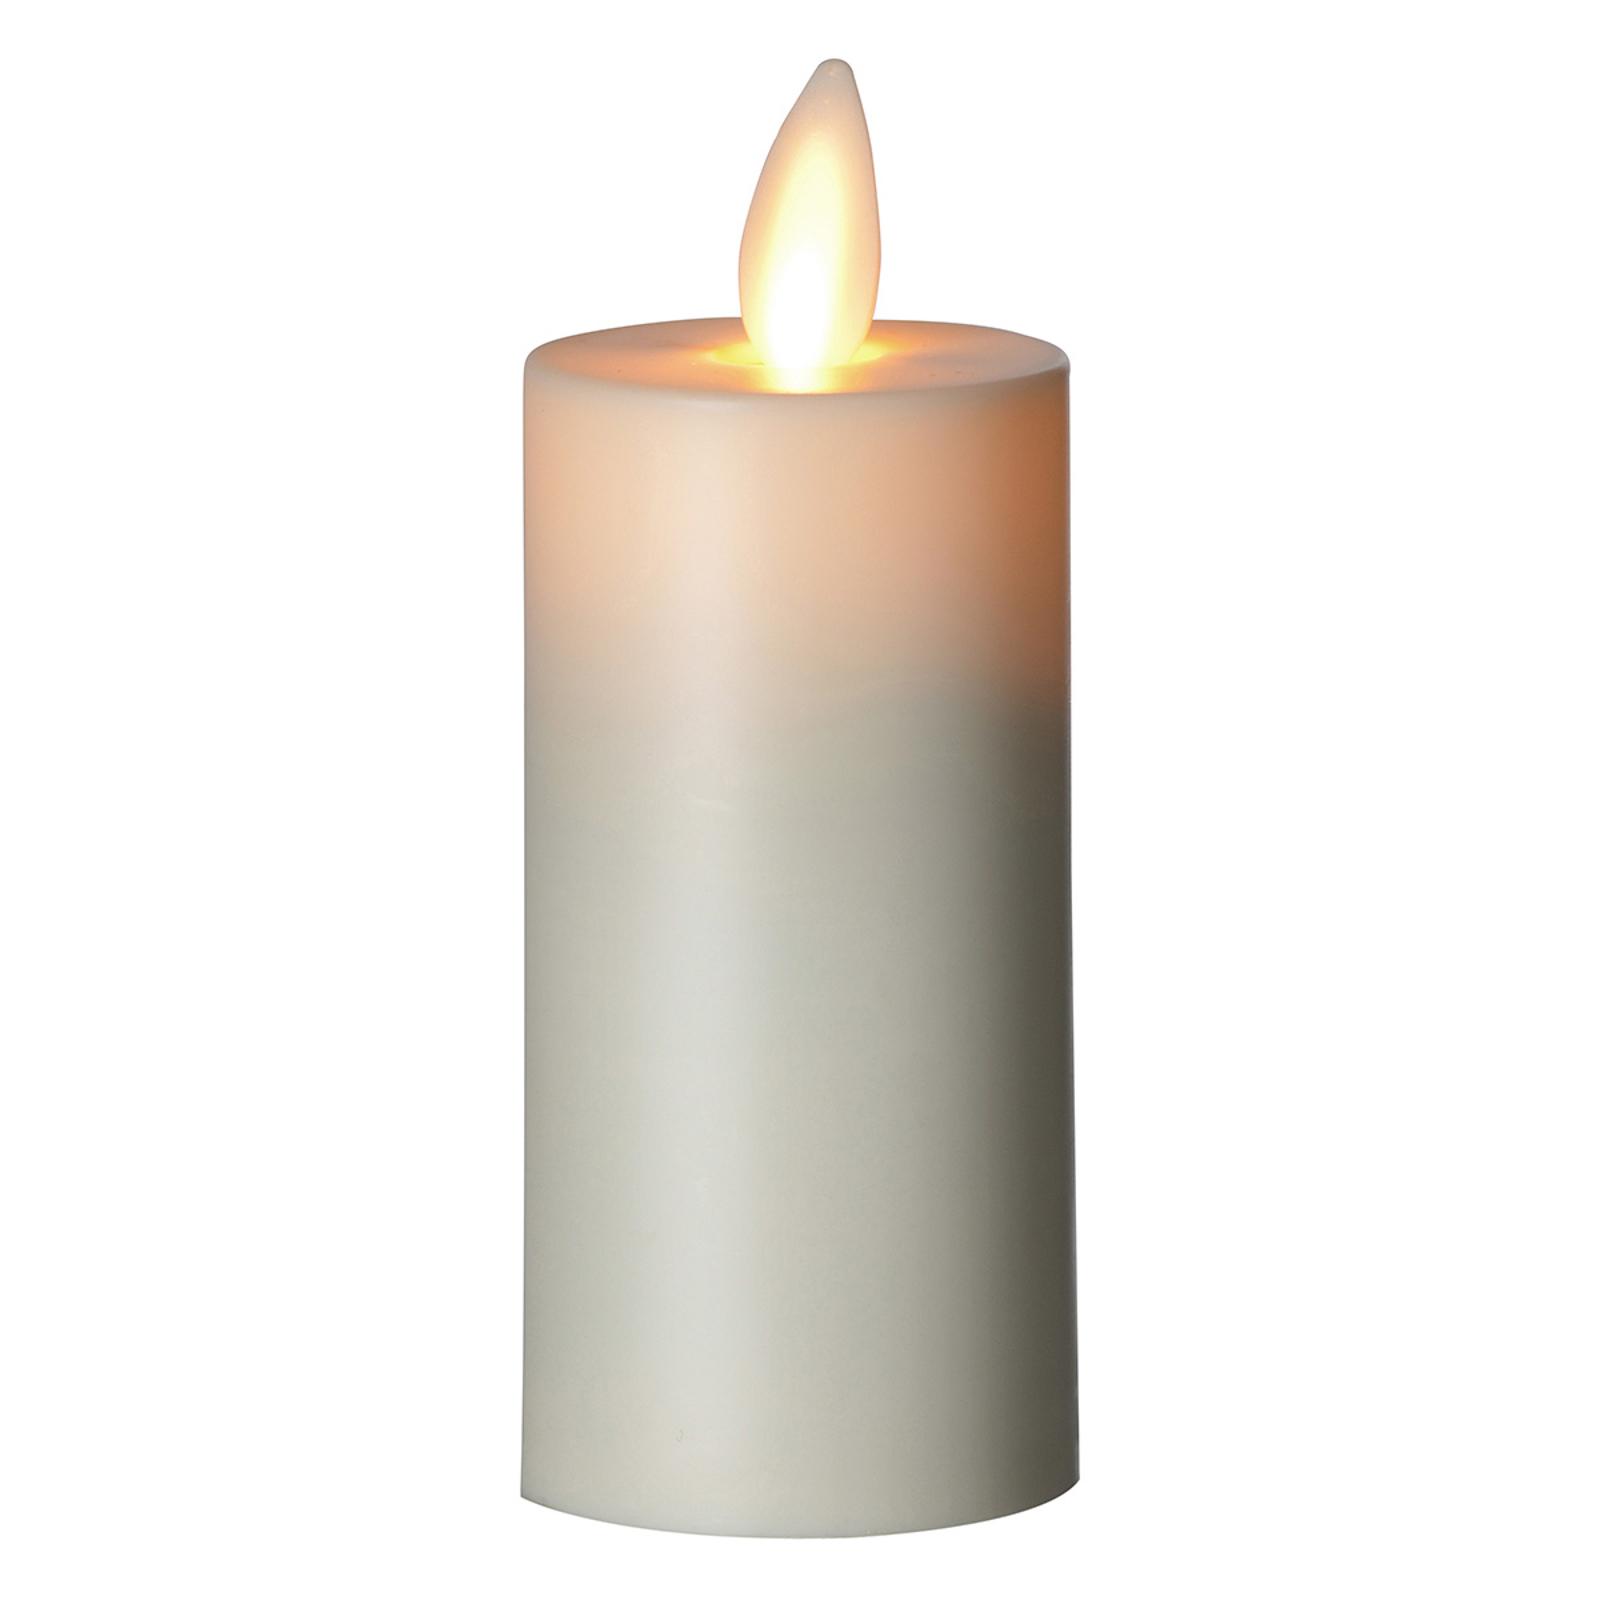 LED-kynttilä Flame lämpökynttilä XL 8,3 cm